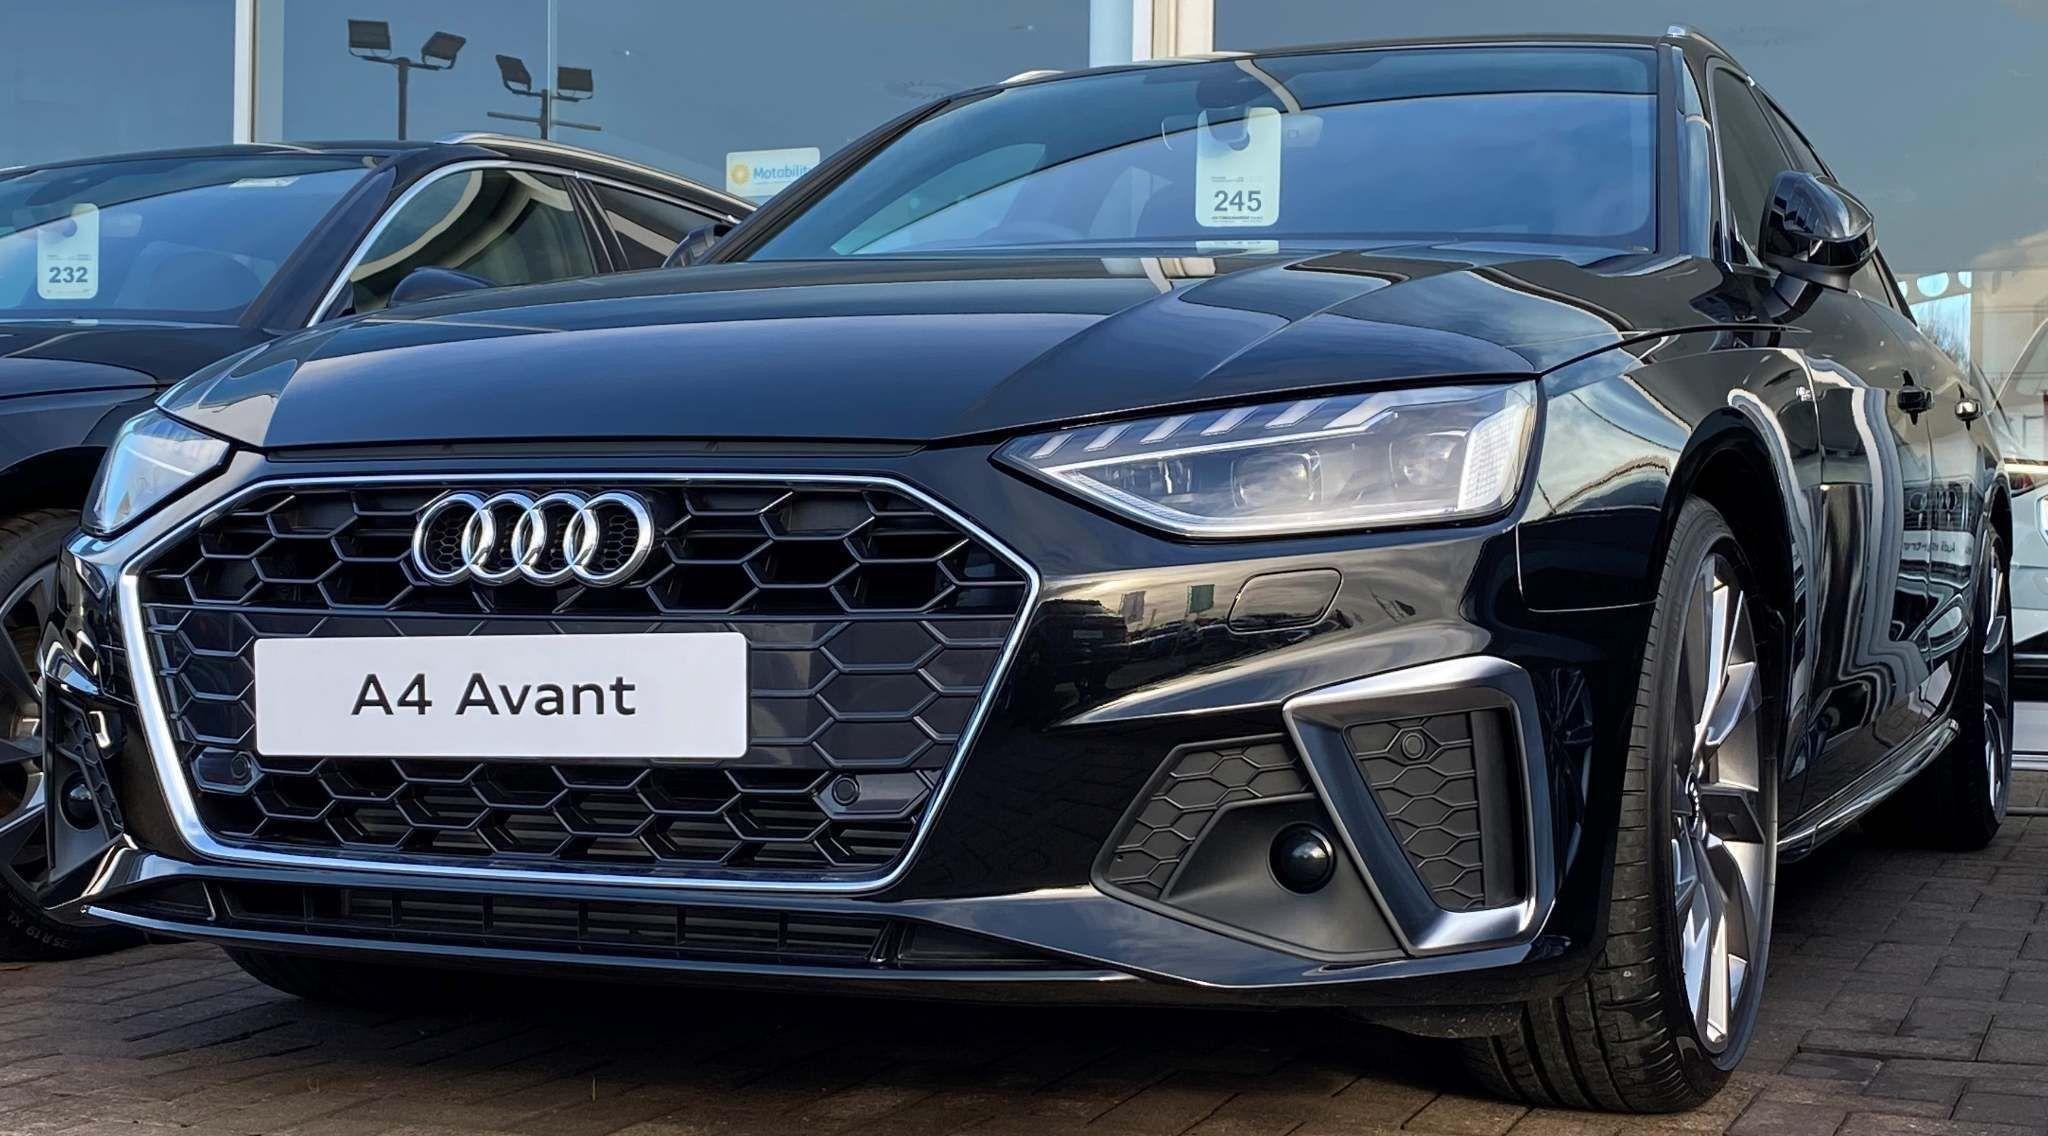 Audi A4 Avant 2 0 Tfsi 40 S Line Avant S Tronic S S 5dr In 2020 Audi A4 Audi Used Audi